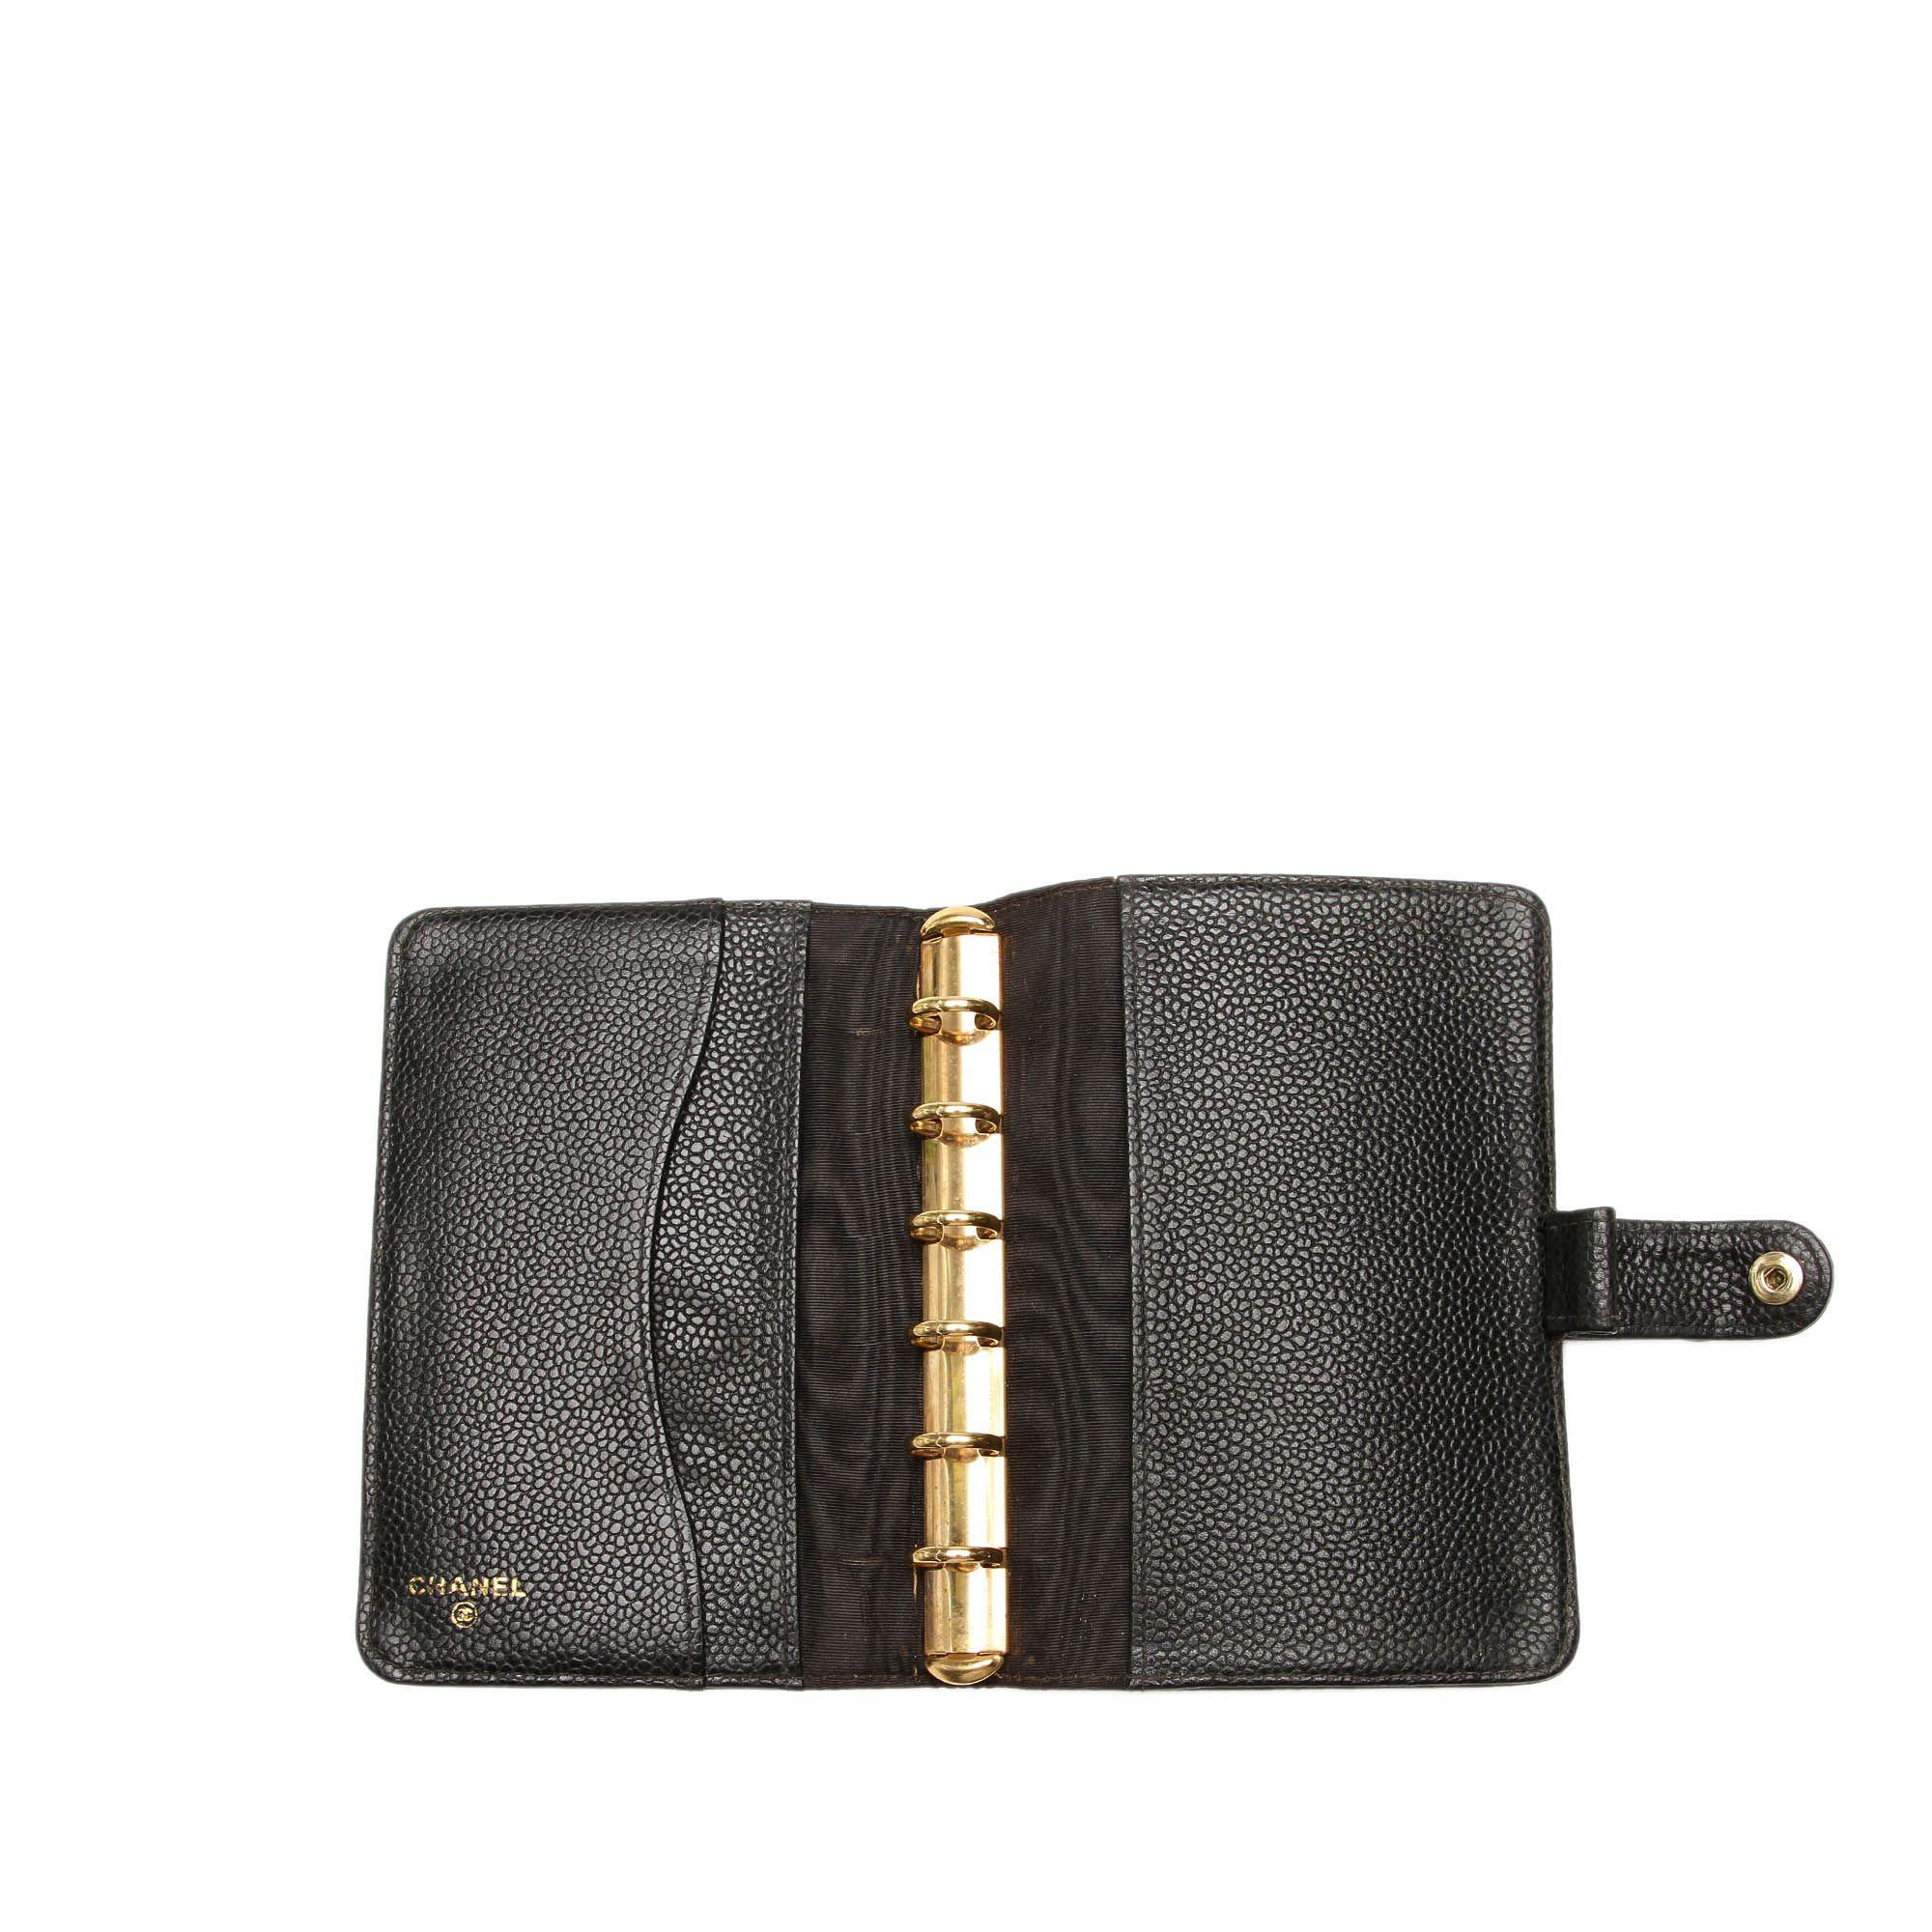 Vintage Chanel CC Caviar Leather Wallet Black